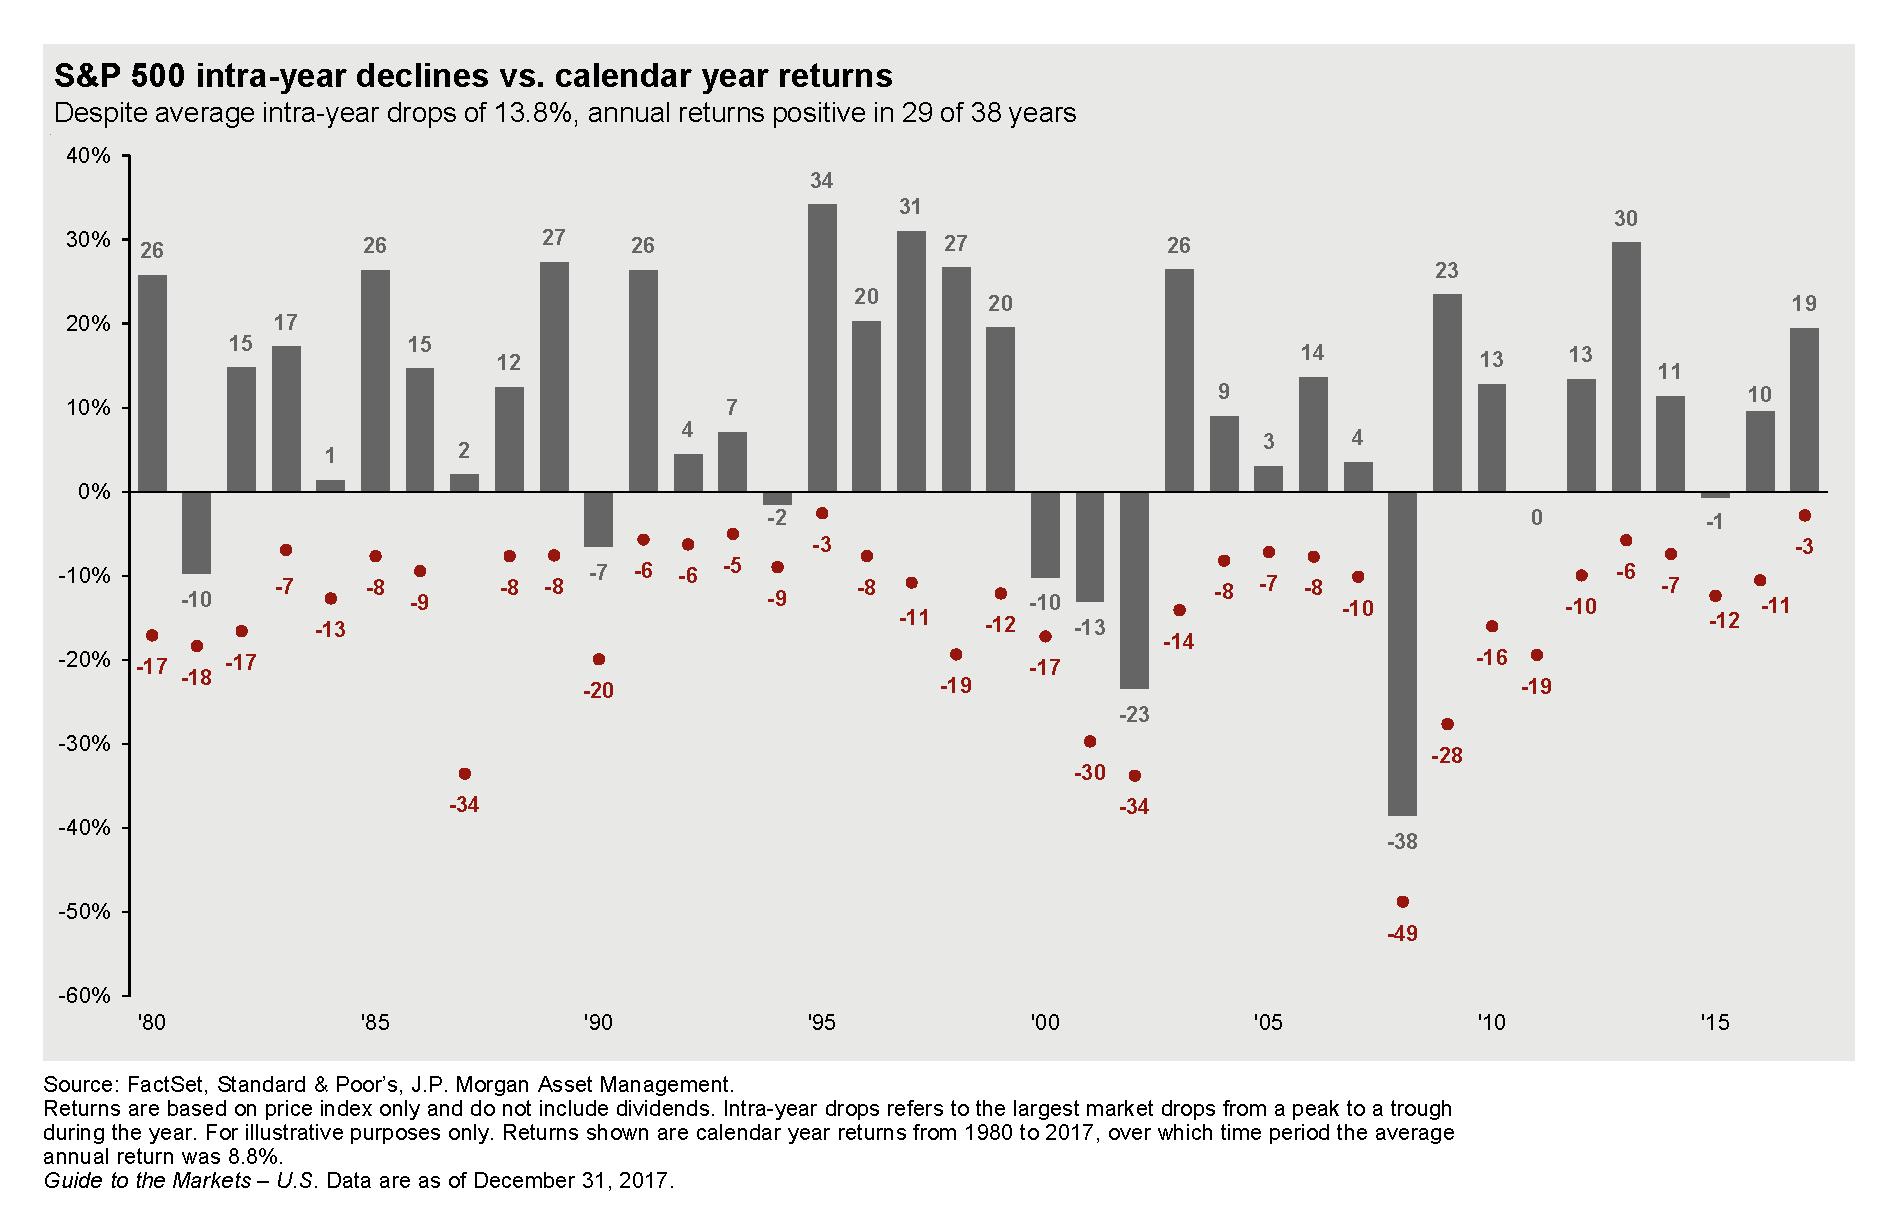 Redit Levitas: Volatility Returns Regarding S&p 500 Intra Year Declines Historical